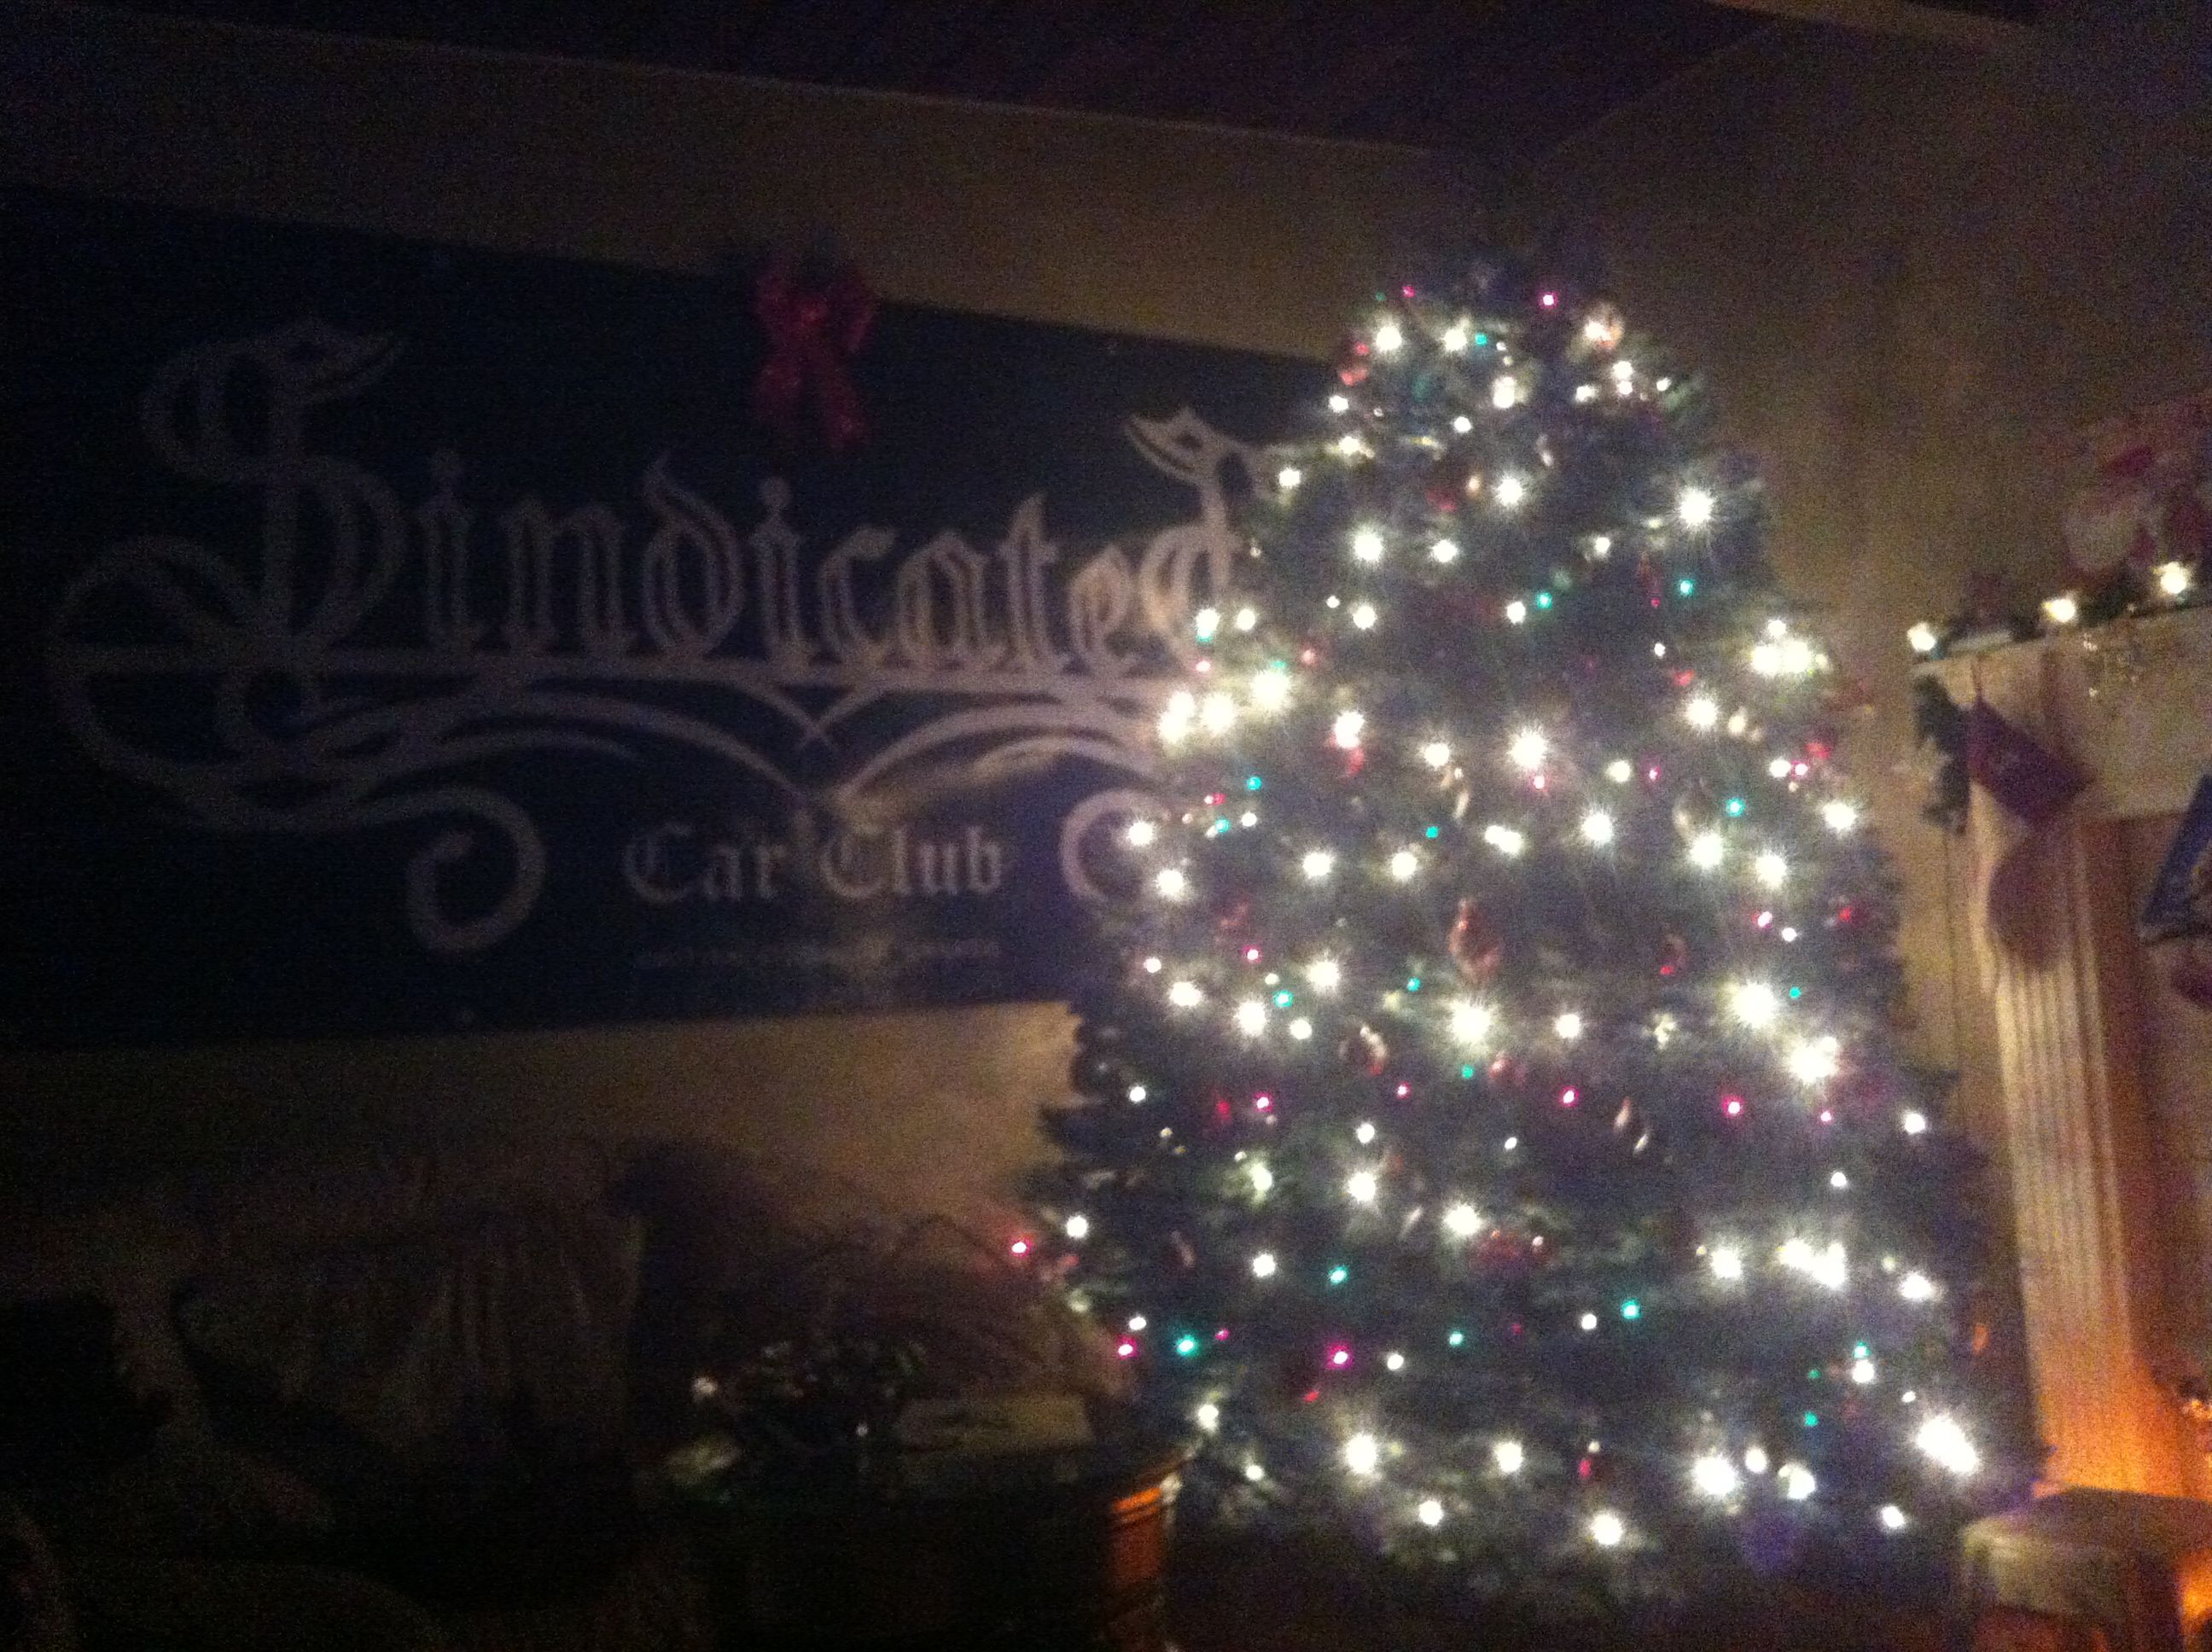 Christmas 2013 SindicateS Car Club